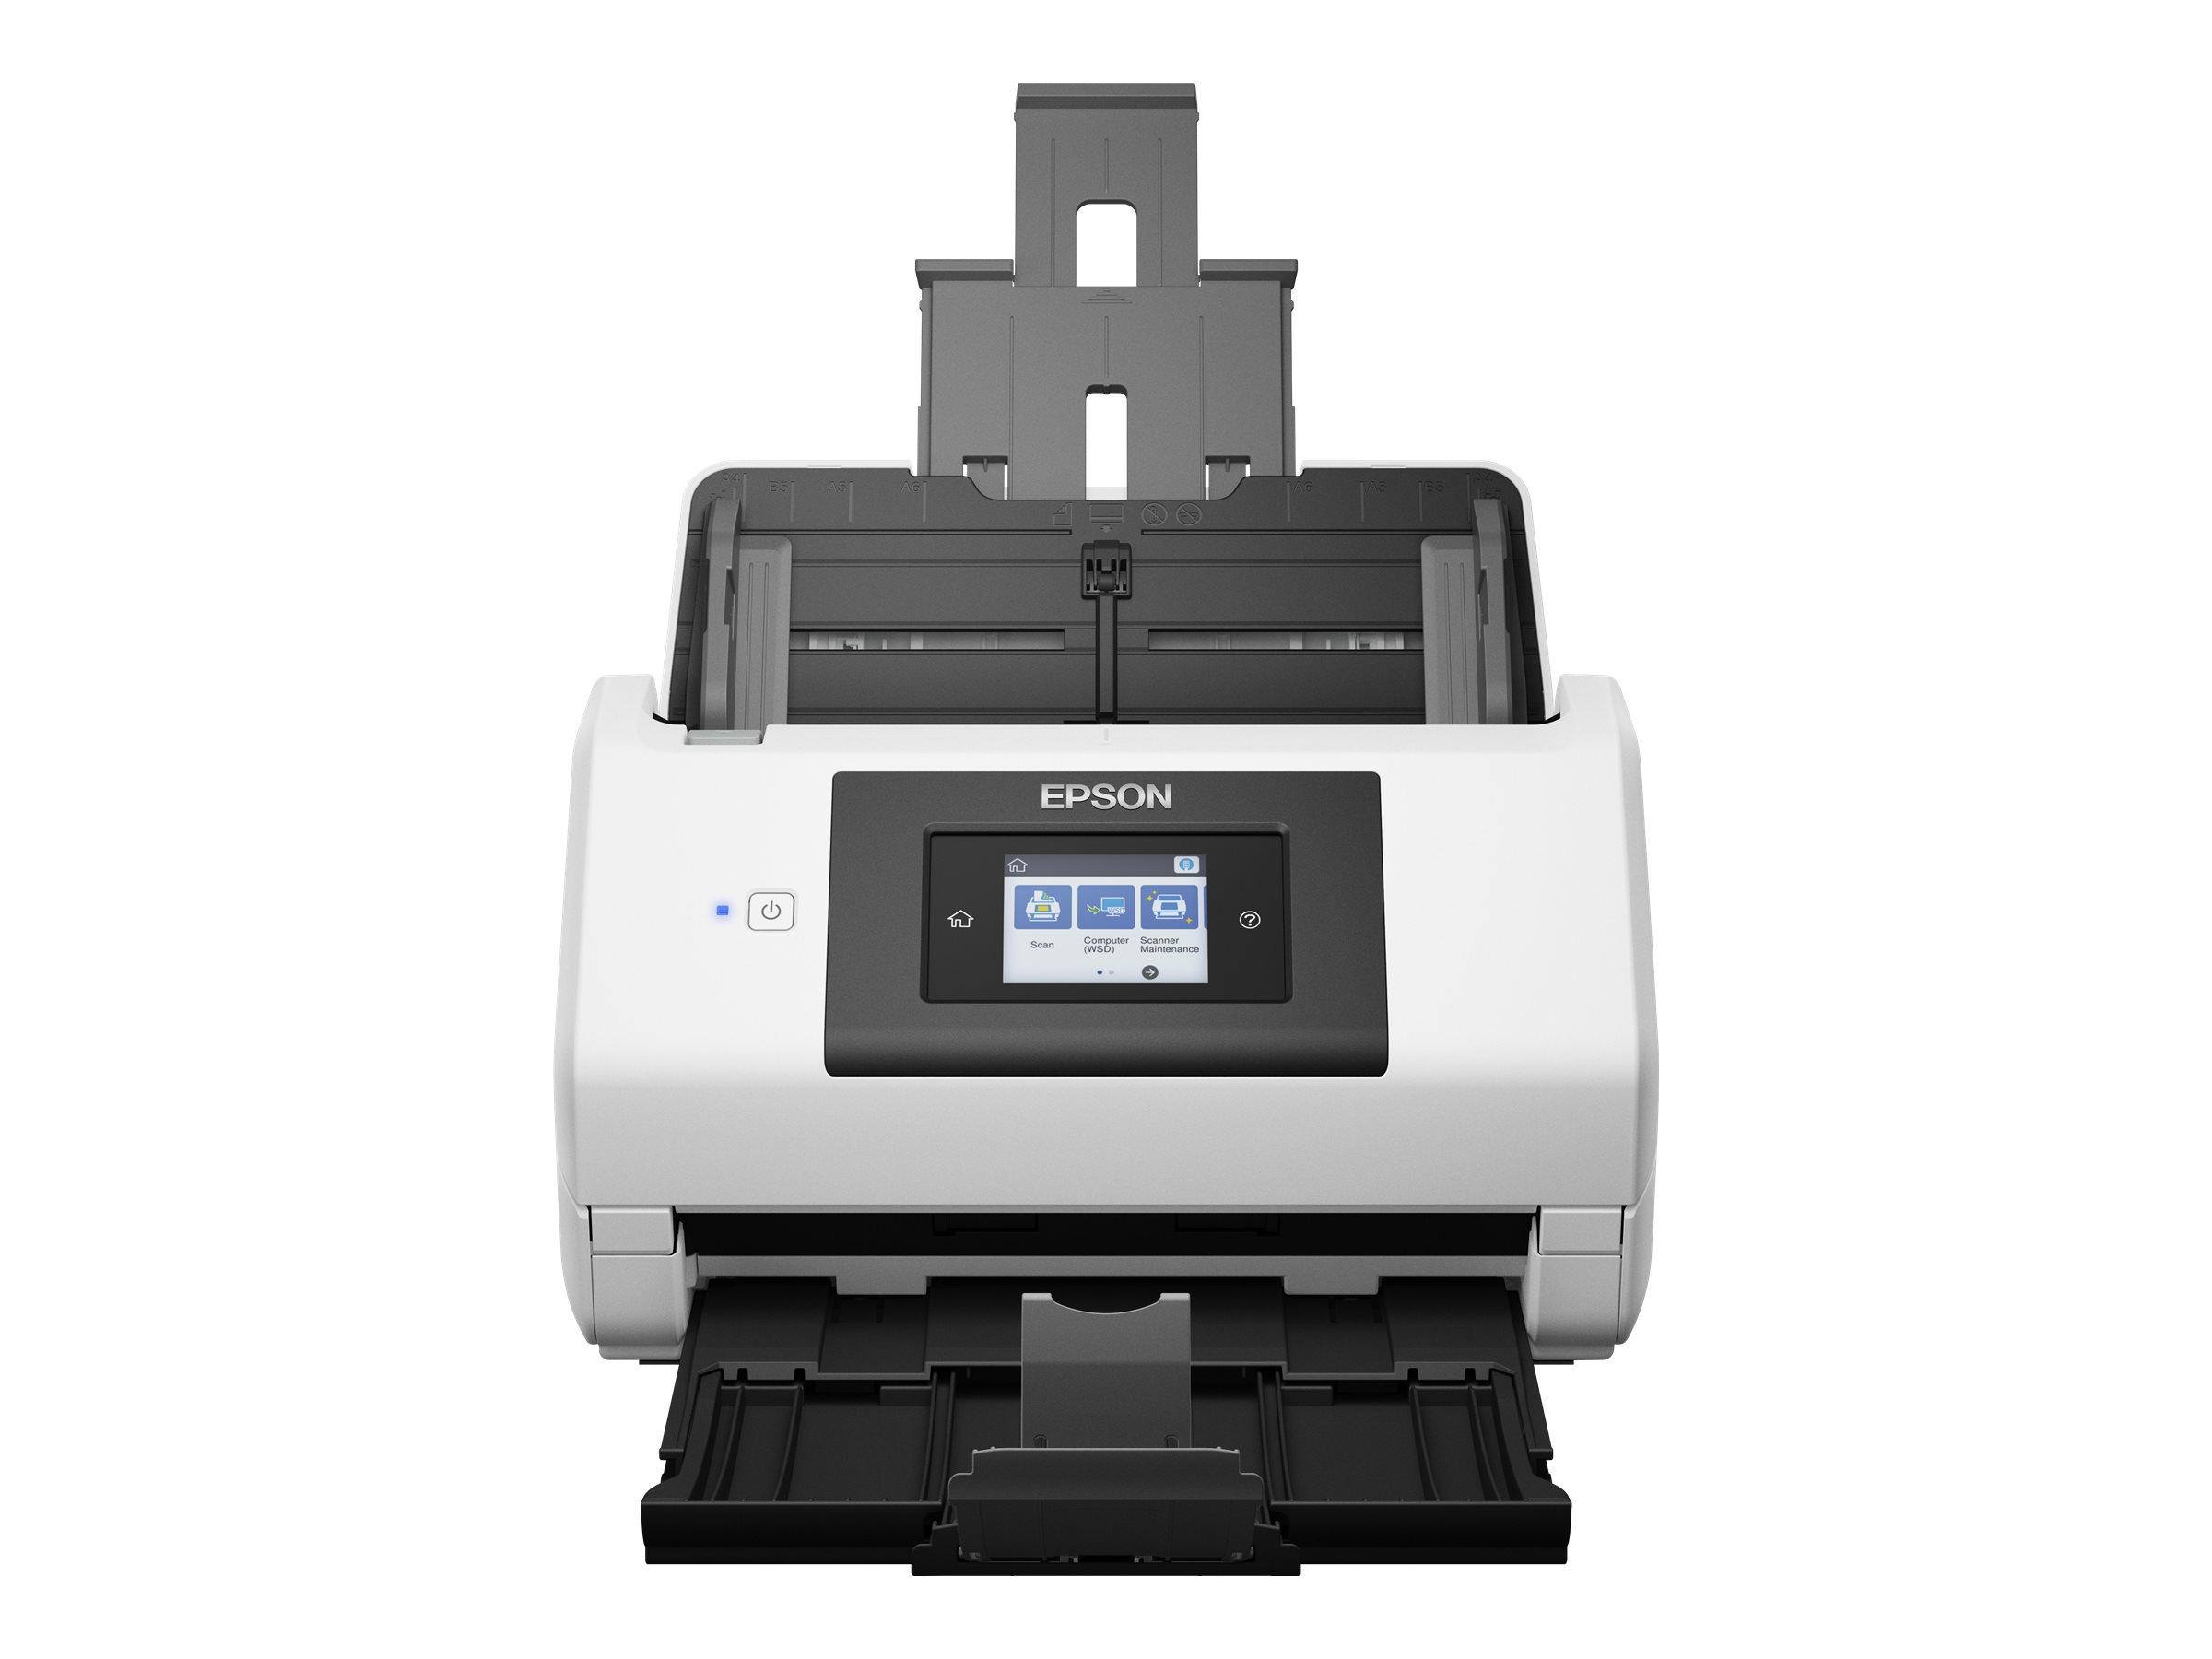 Epson WorkForce DS-780N - Dokumentenscanner